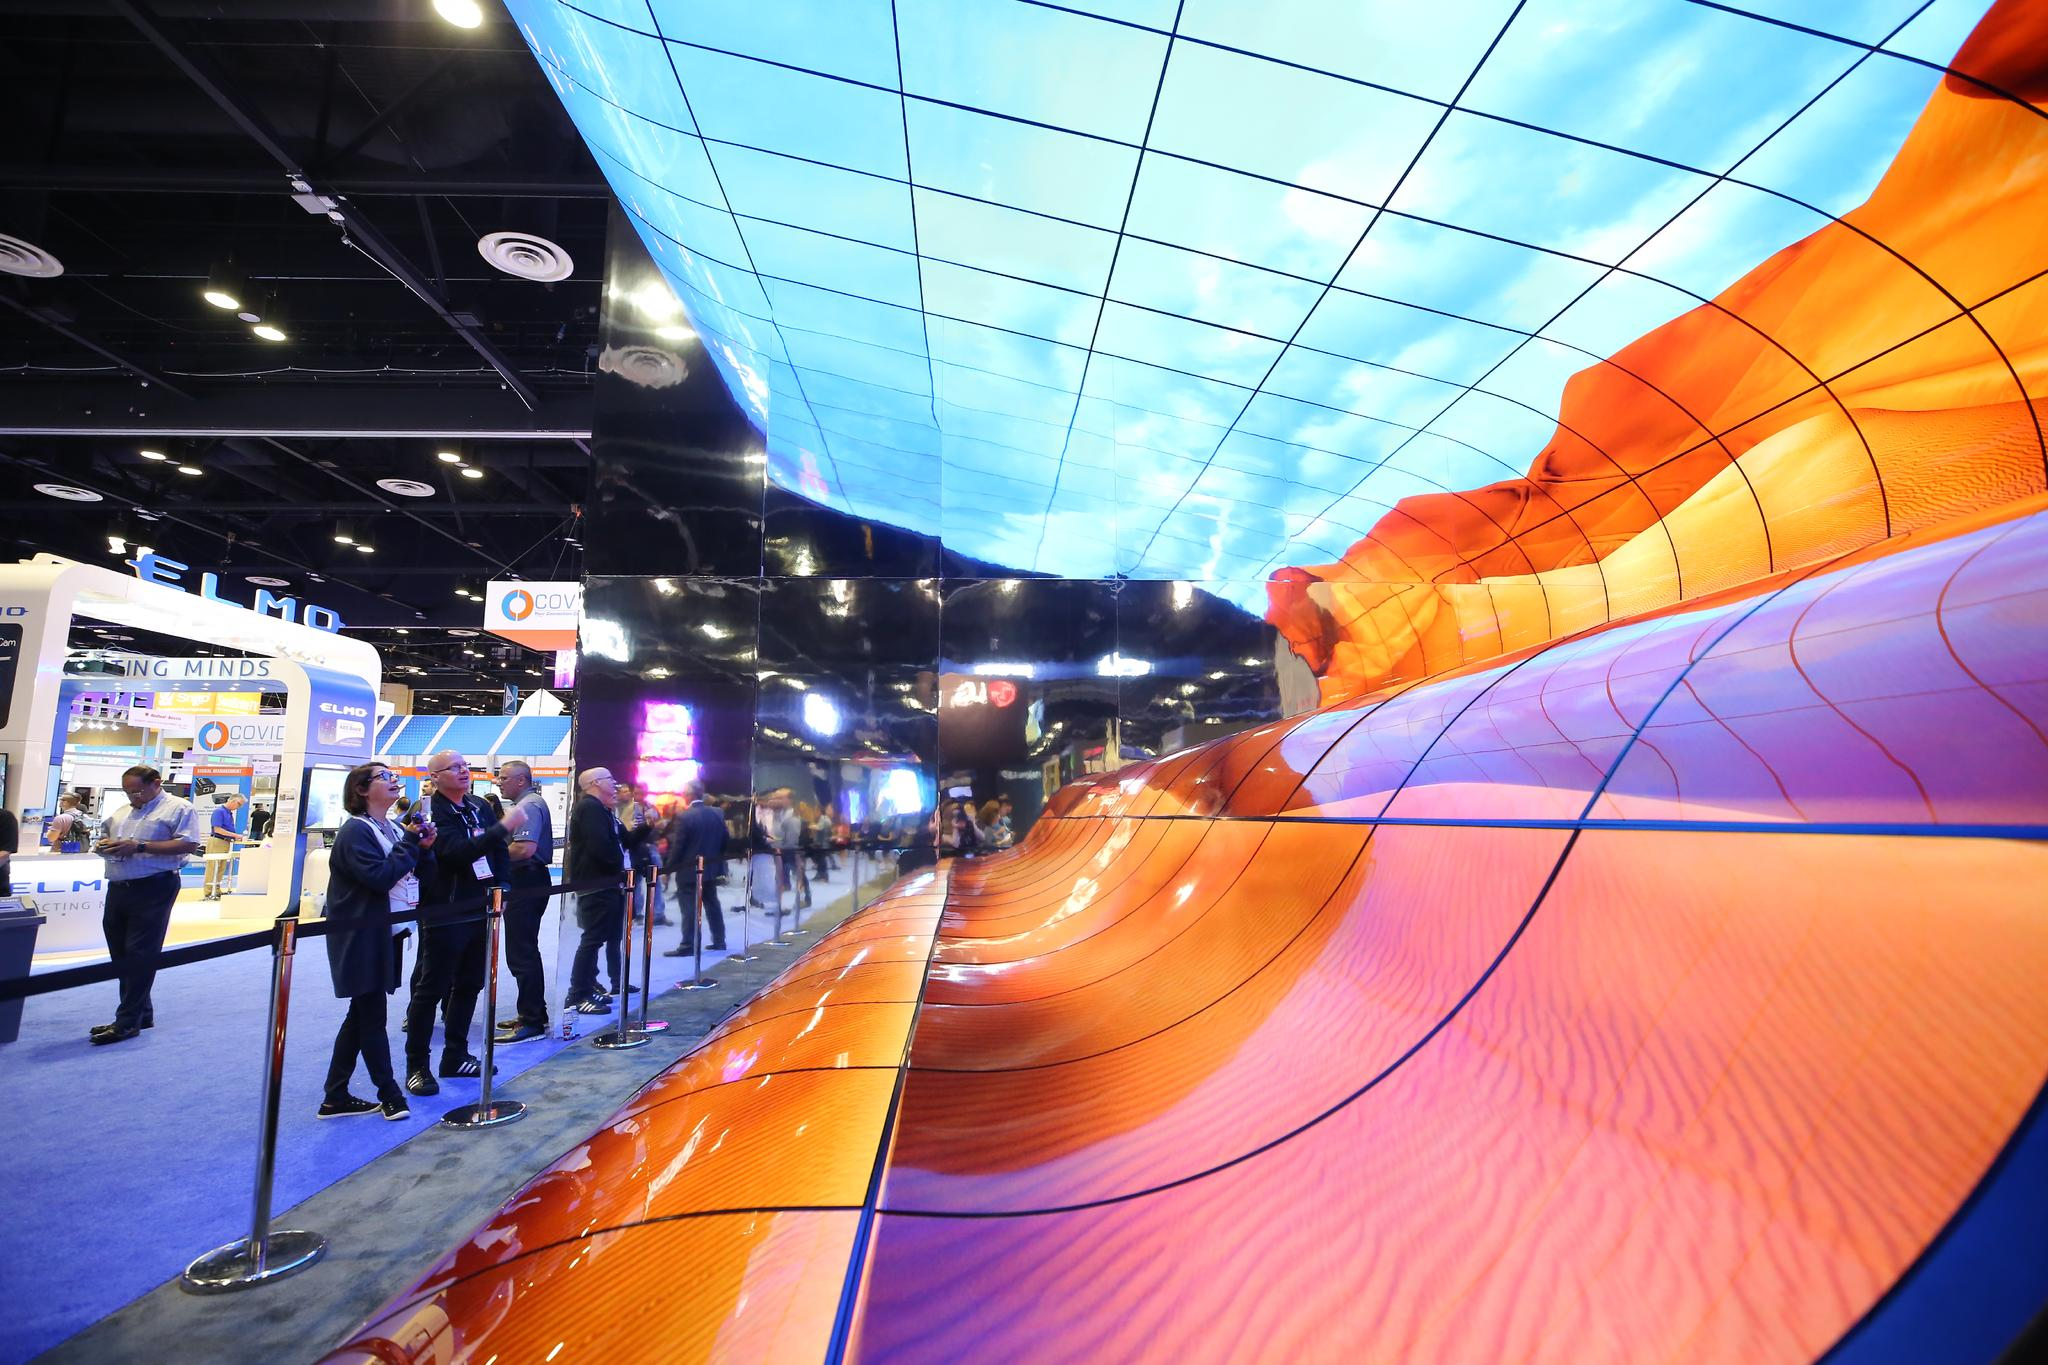 Immersive AV Meets the Built Environment at TIDE 2020